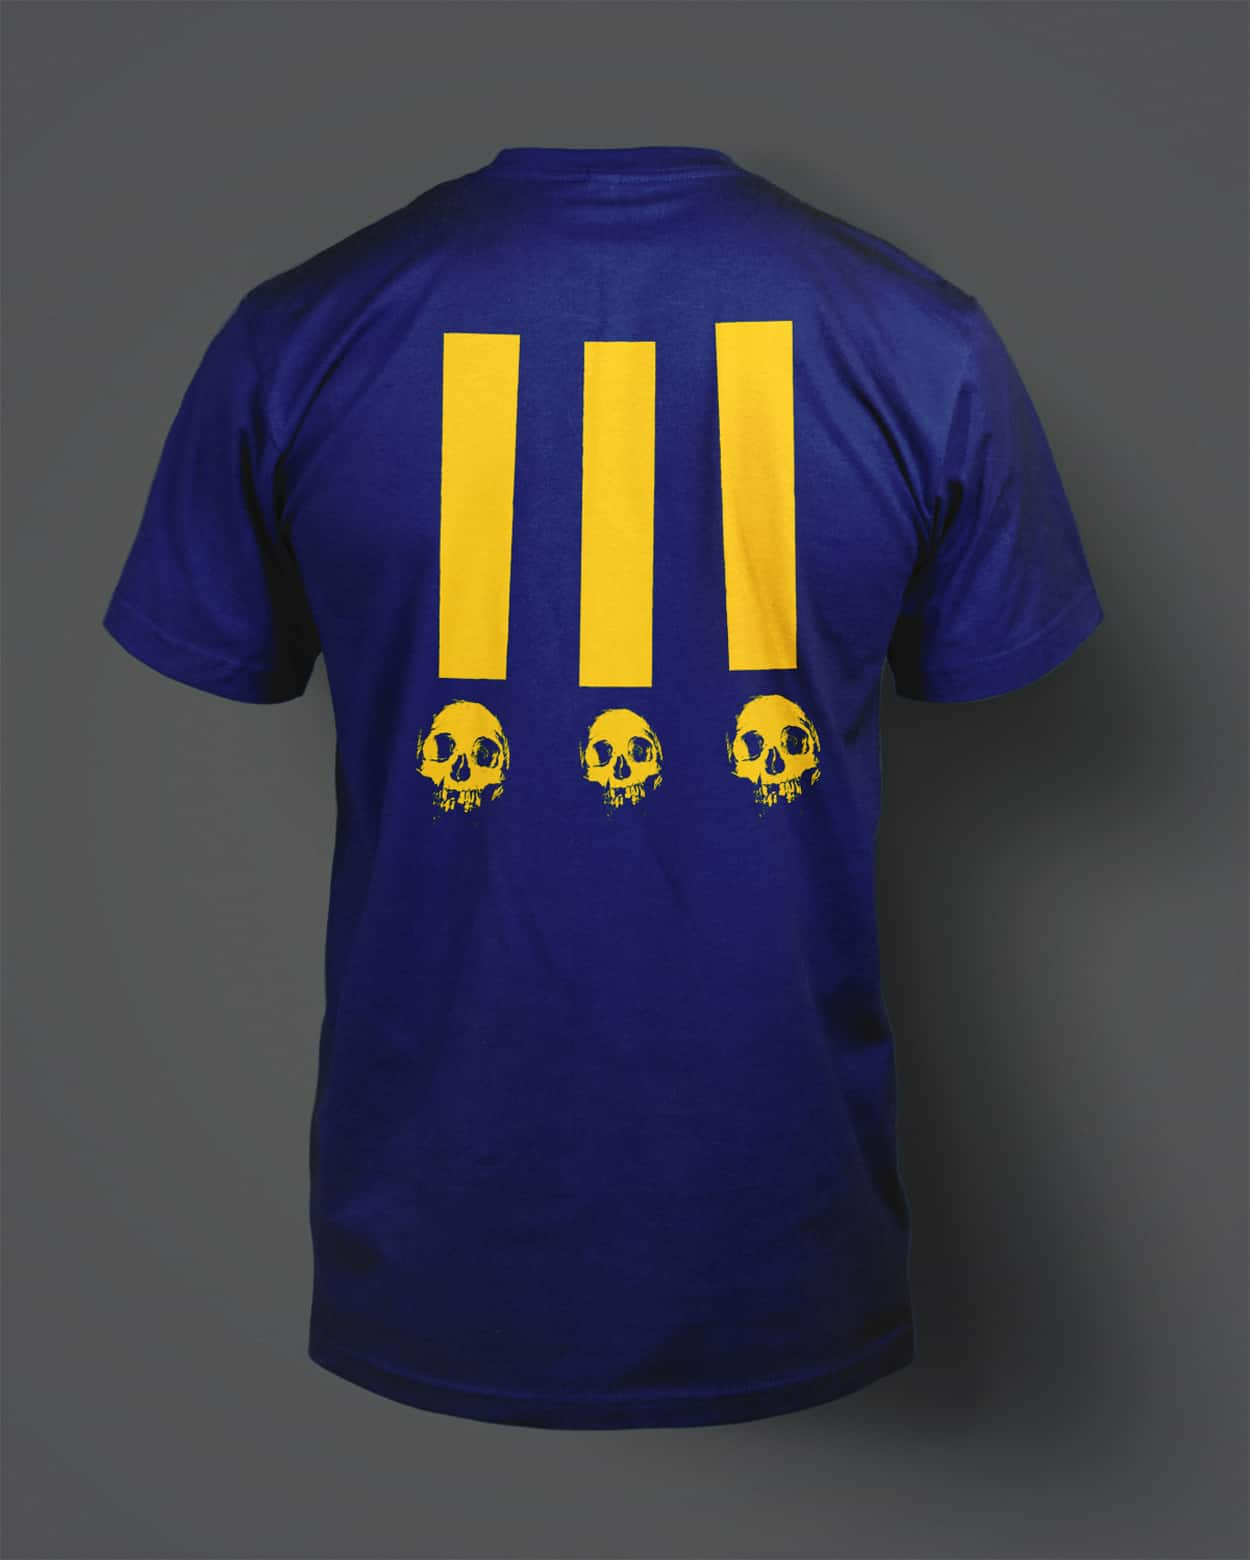 kid presentable - stay illuminated - t-shirt design - logo - badge